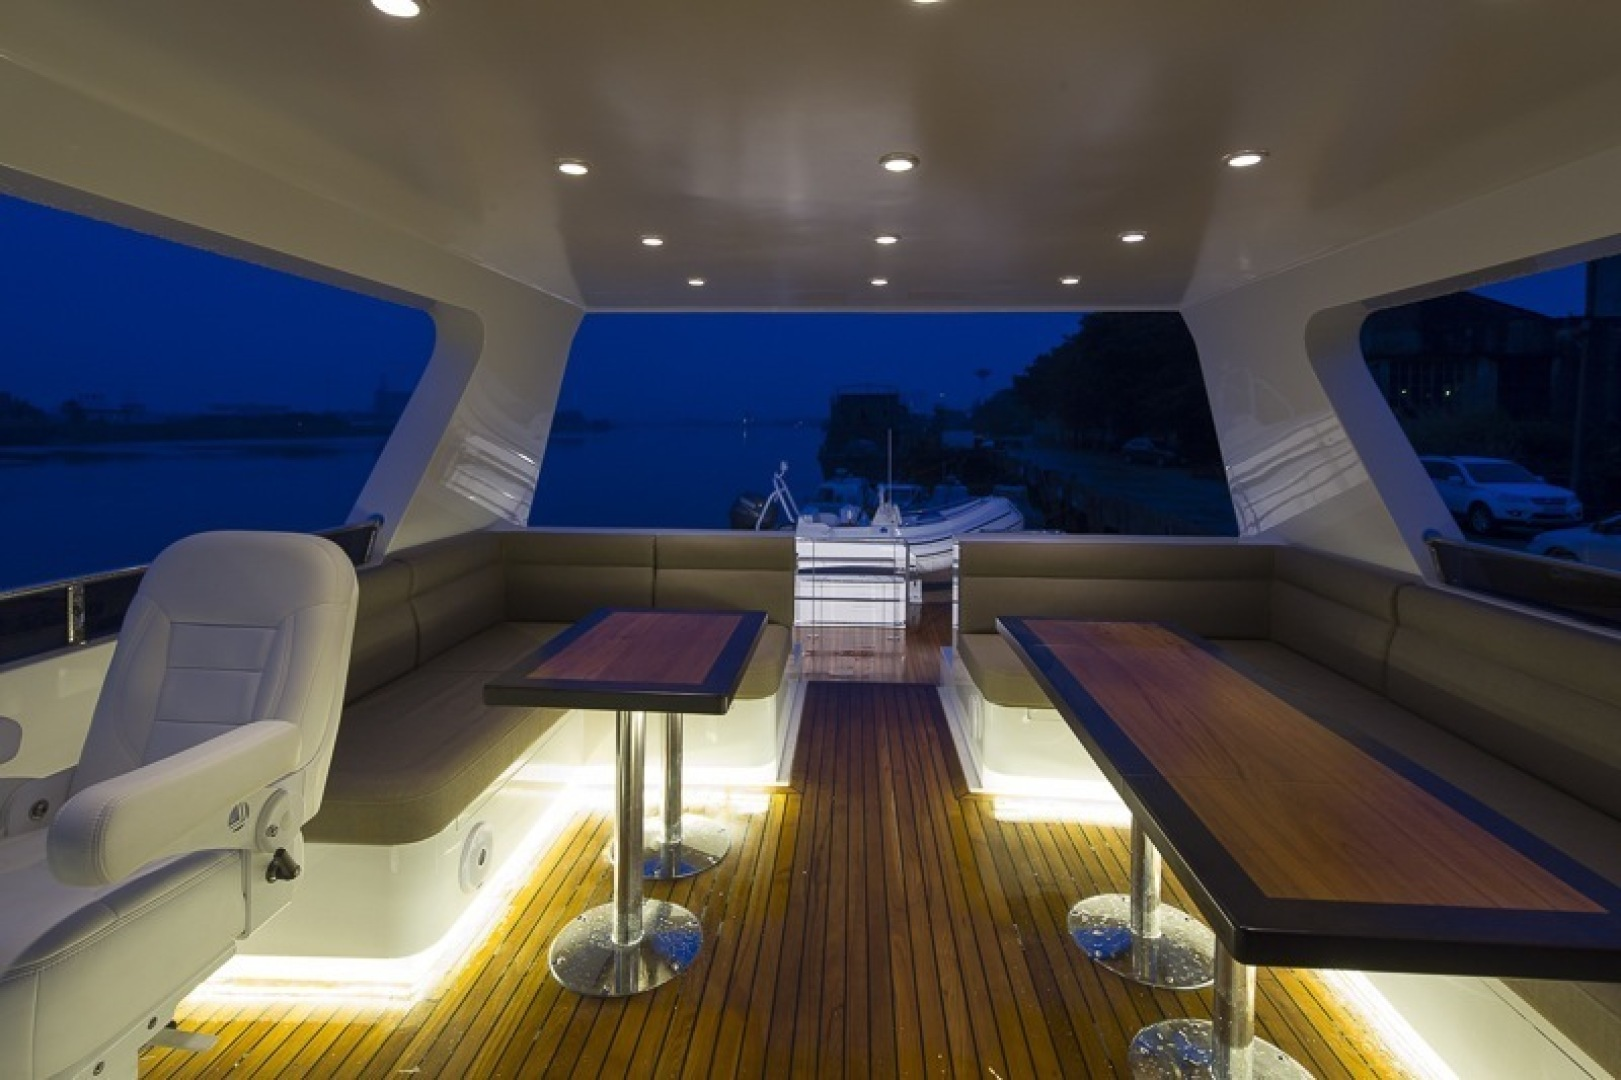 Bering-65 Bering Yacht 2013-Namaste Dania-Florida-United States-1401012   Thumbnail